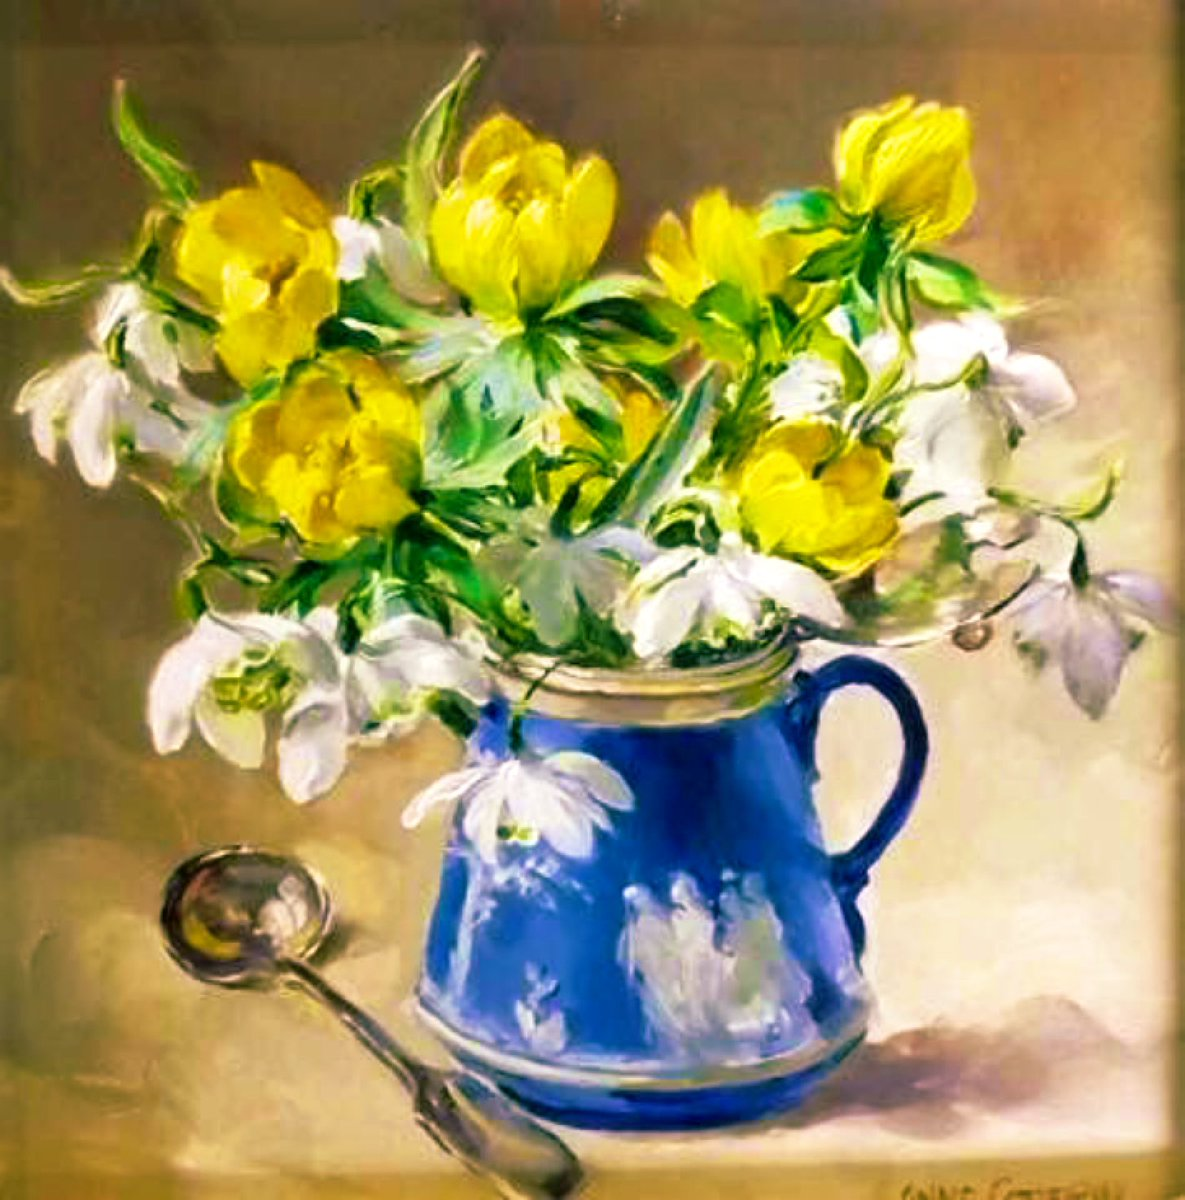 Snowdrops & Celandines~Anne Cotterill #London  #artistic  #artists  #arts  #iloveart  #ArtStationHQ  #FineArtAmerica  #artvsartist  #artgallery  #artstream  #twitart  #artexhibition  #artstudio  #ArtofLegends  #ArtistOnTwitter  #artsy  #USA  #ArtLovers  #painting